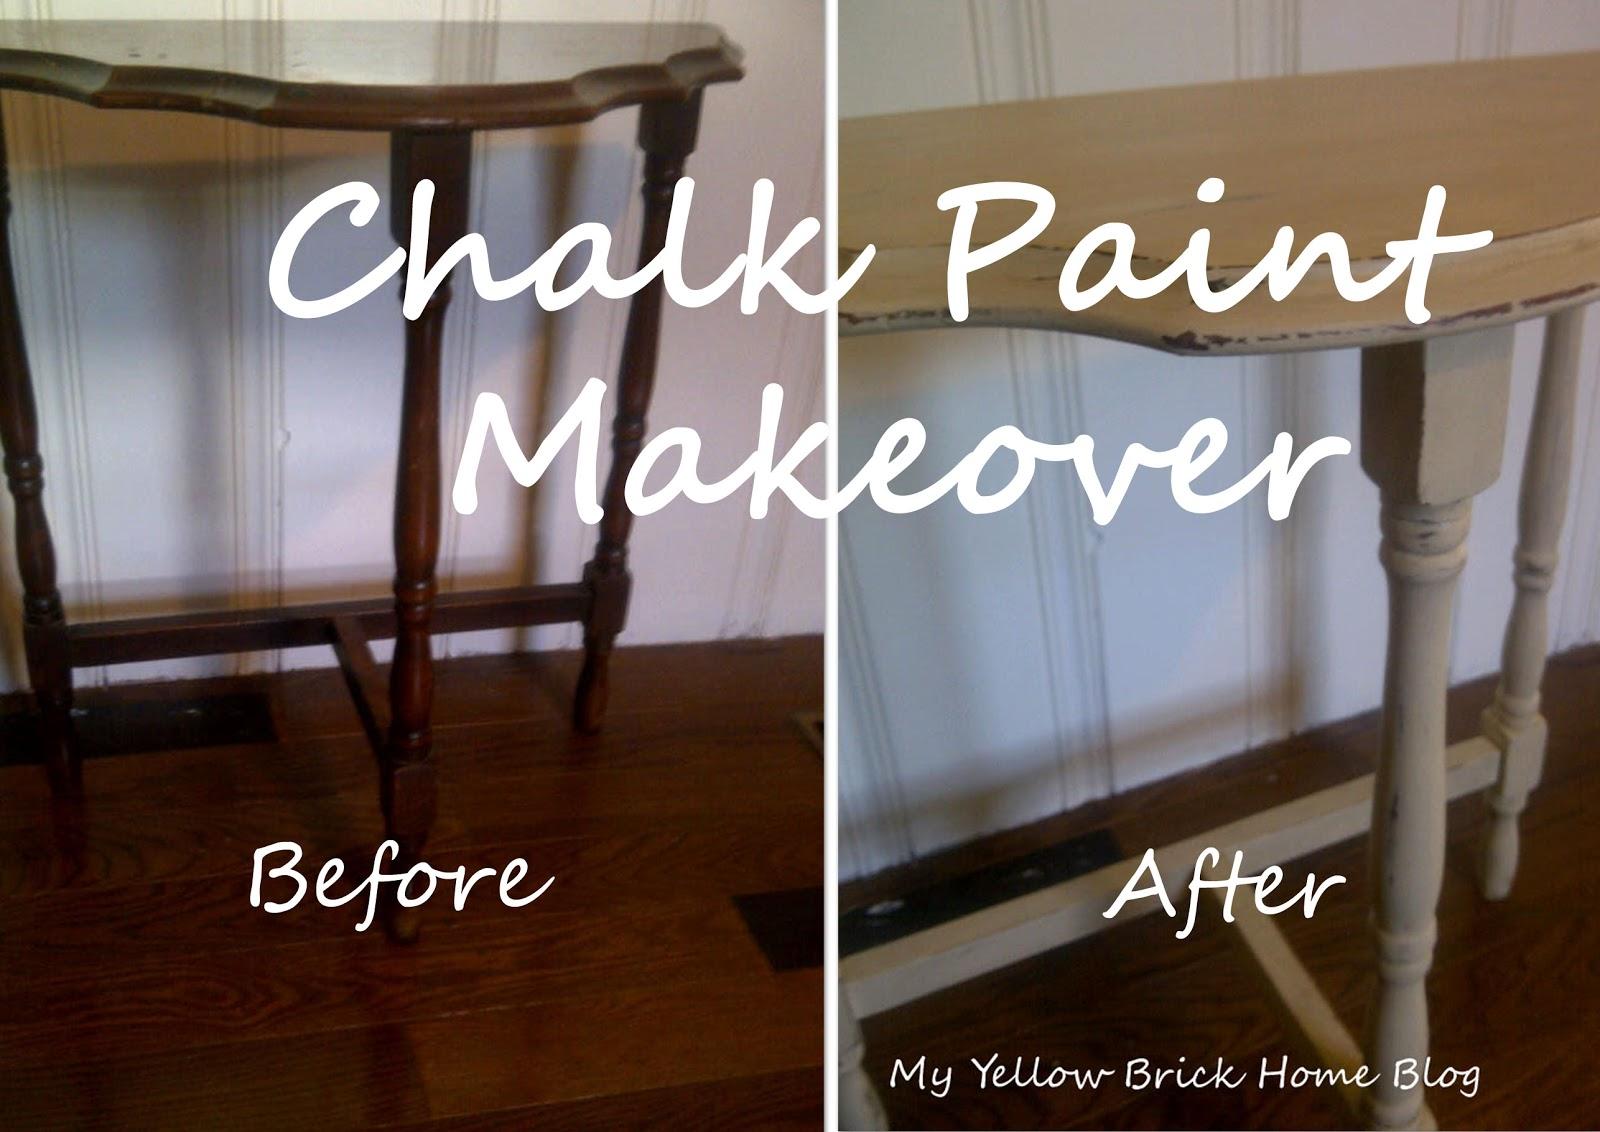 Brick home love chalk paint makeover